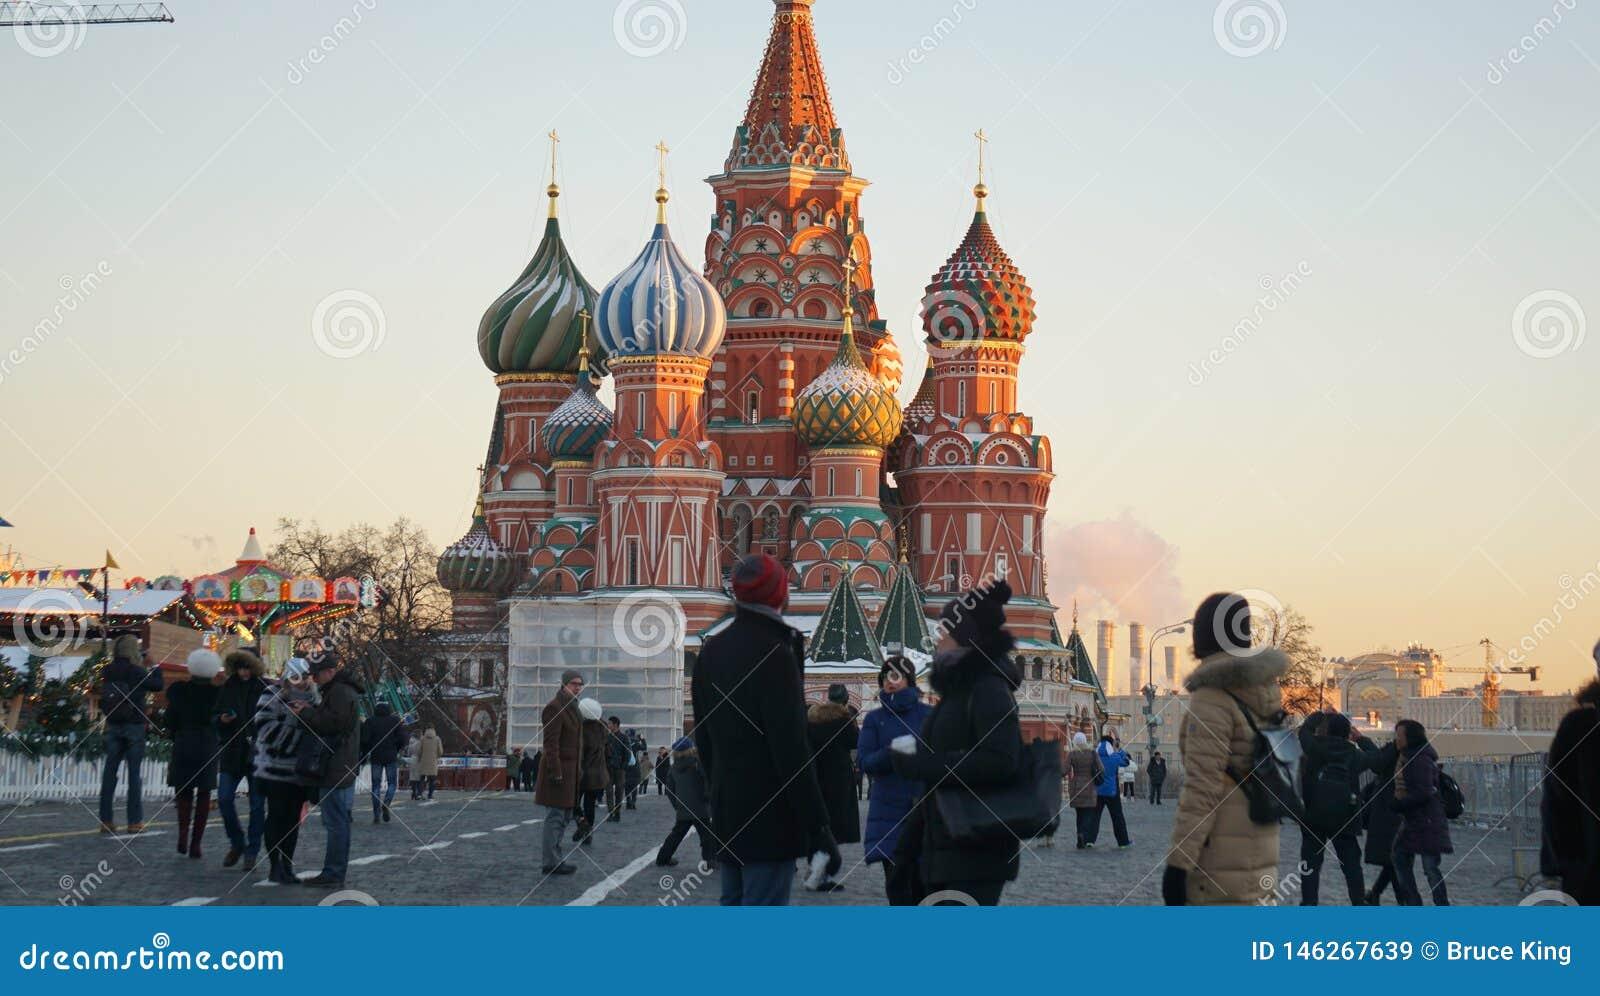 Russian church,Saint Basil`s Cathedral,Christian